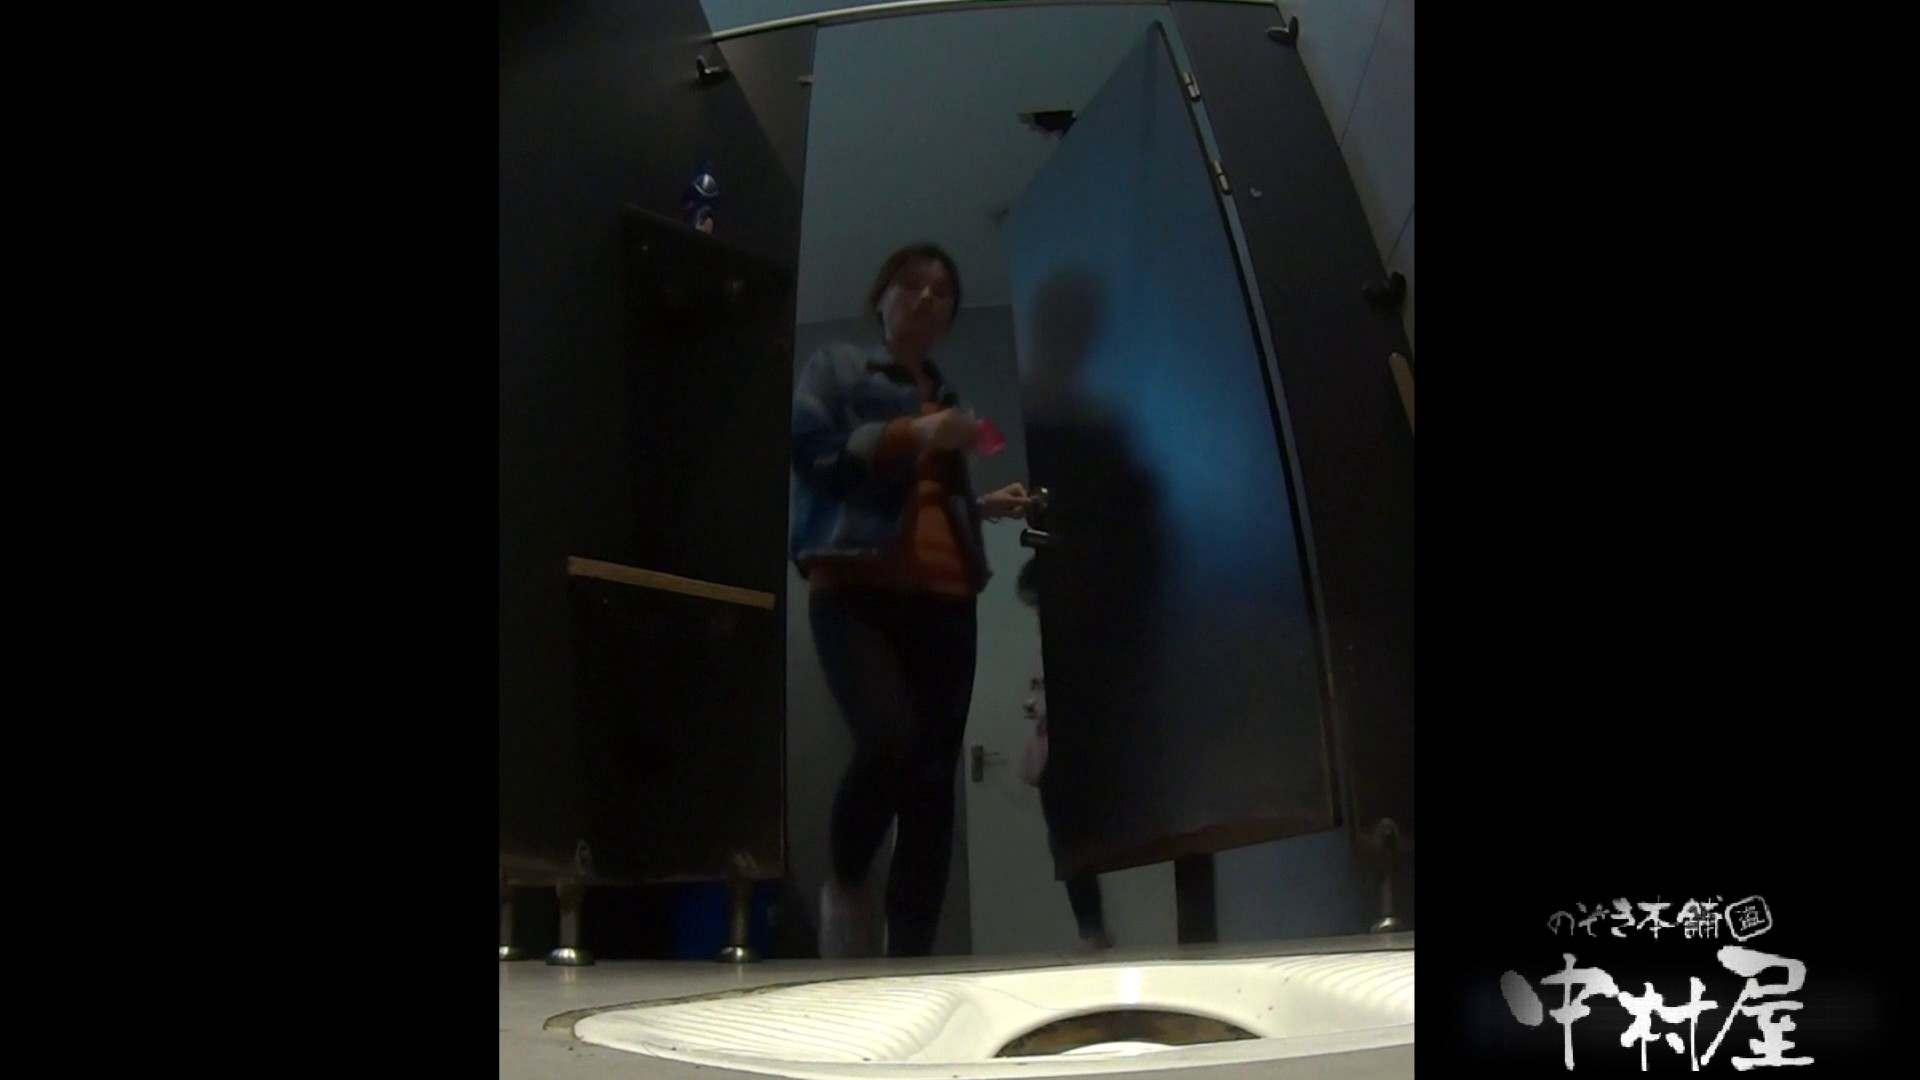 大学休憩時間の洗面所事情21 盗撮シリーズ  108PIX 84